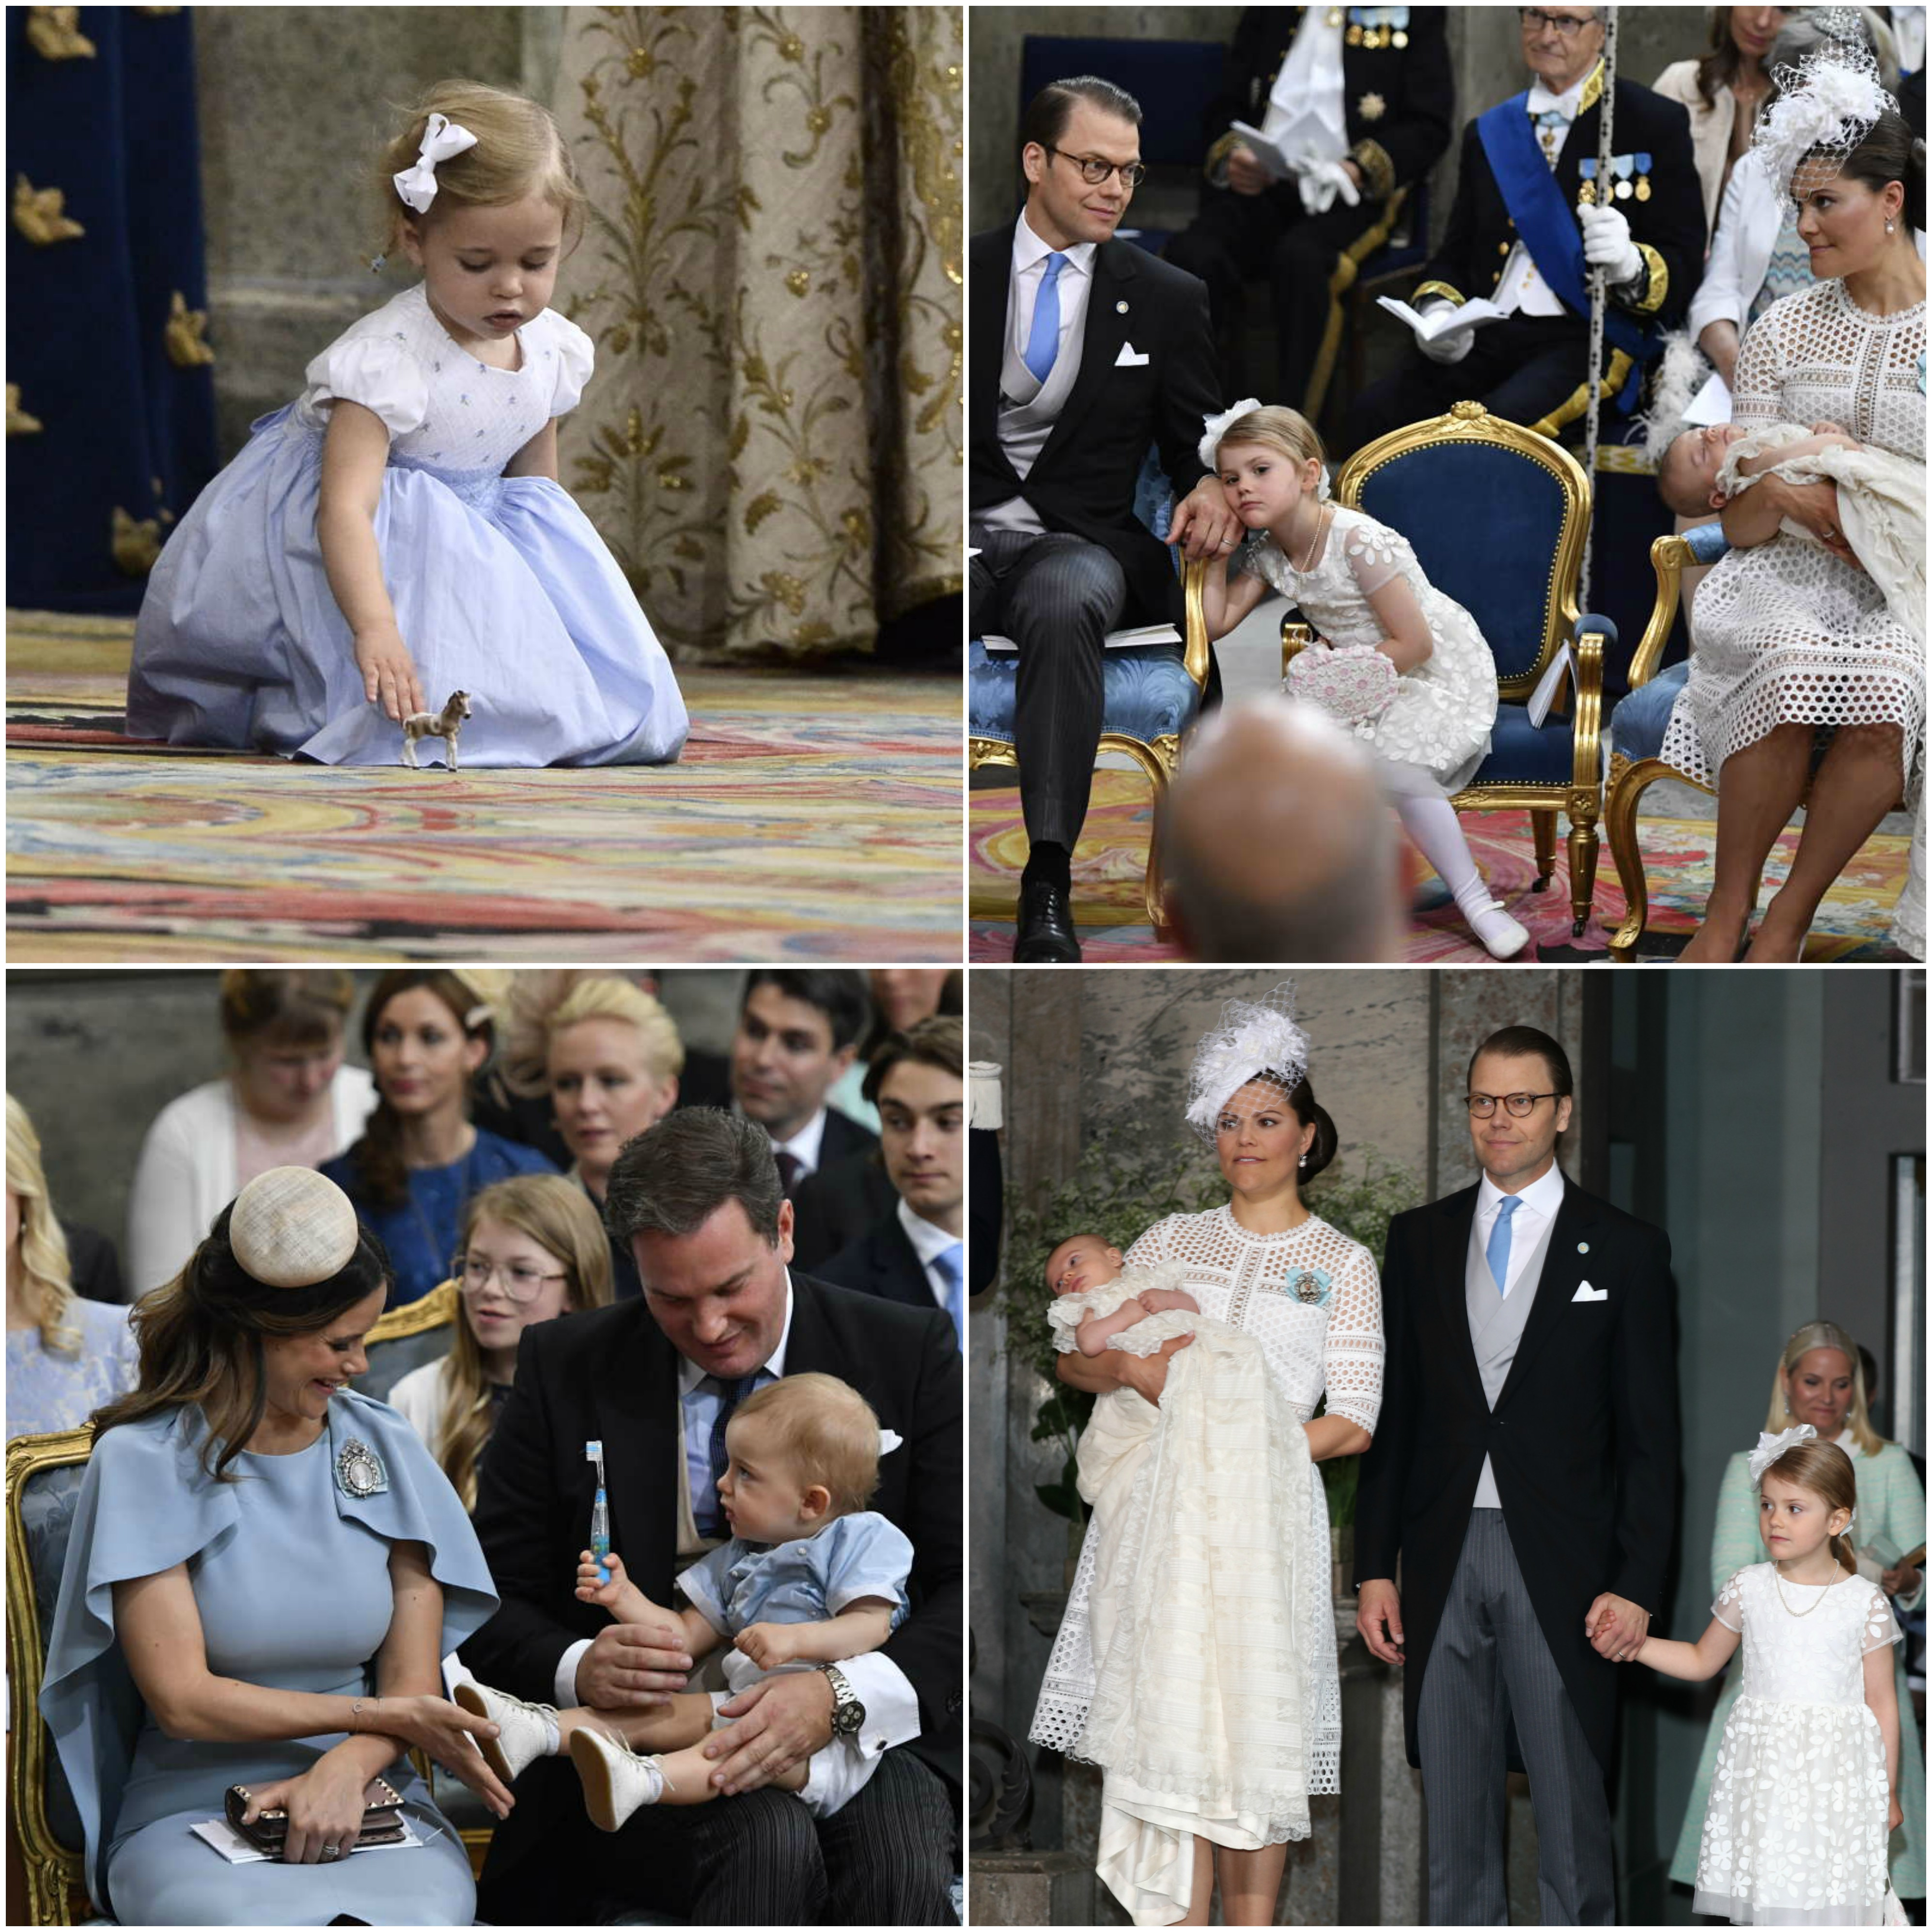 various photos swedish royal family celebrates prince oscar christneing